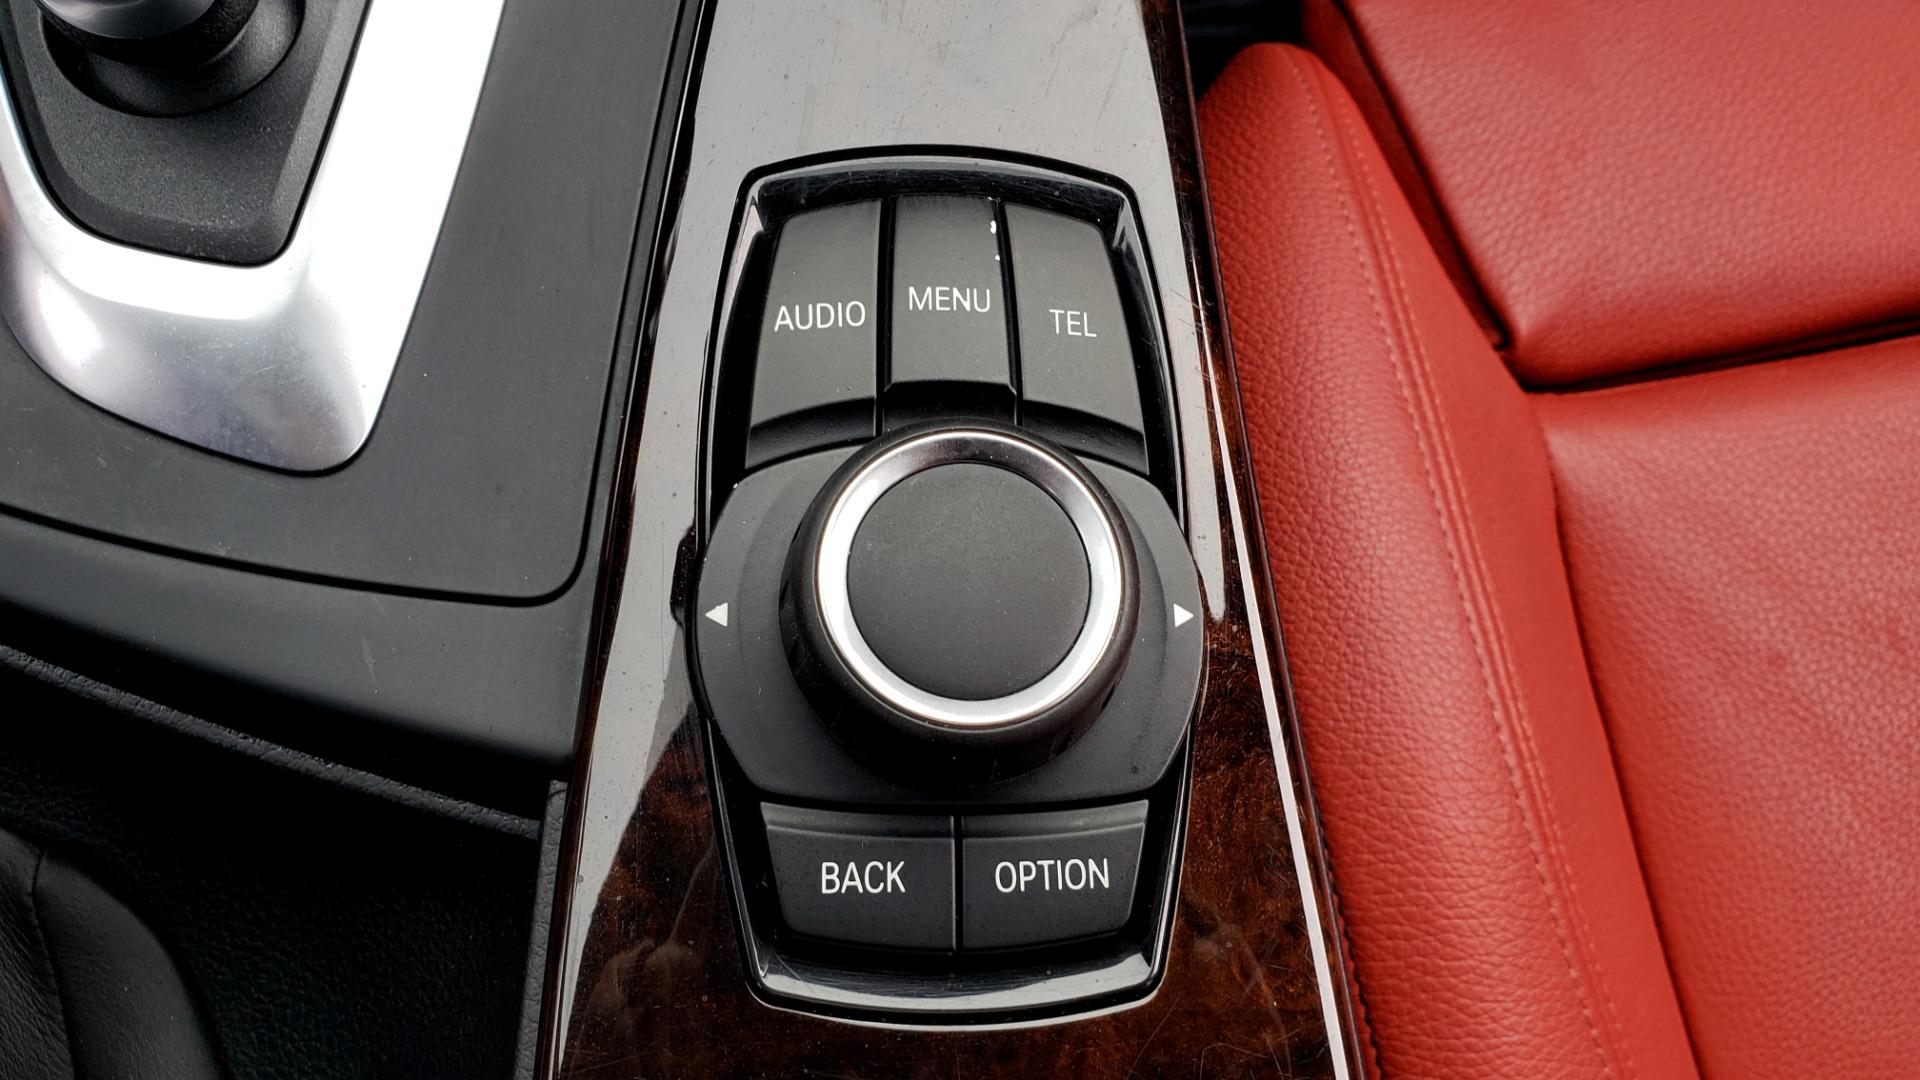 Used 2015 BMW 3 Series 335I M-SPORT / PREM PKG / HK SND / SUNROOF / REARVIEW for sale Sold at Formula Imports in Charlotte NC 28227 50